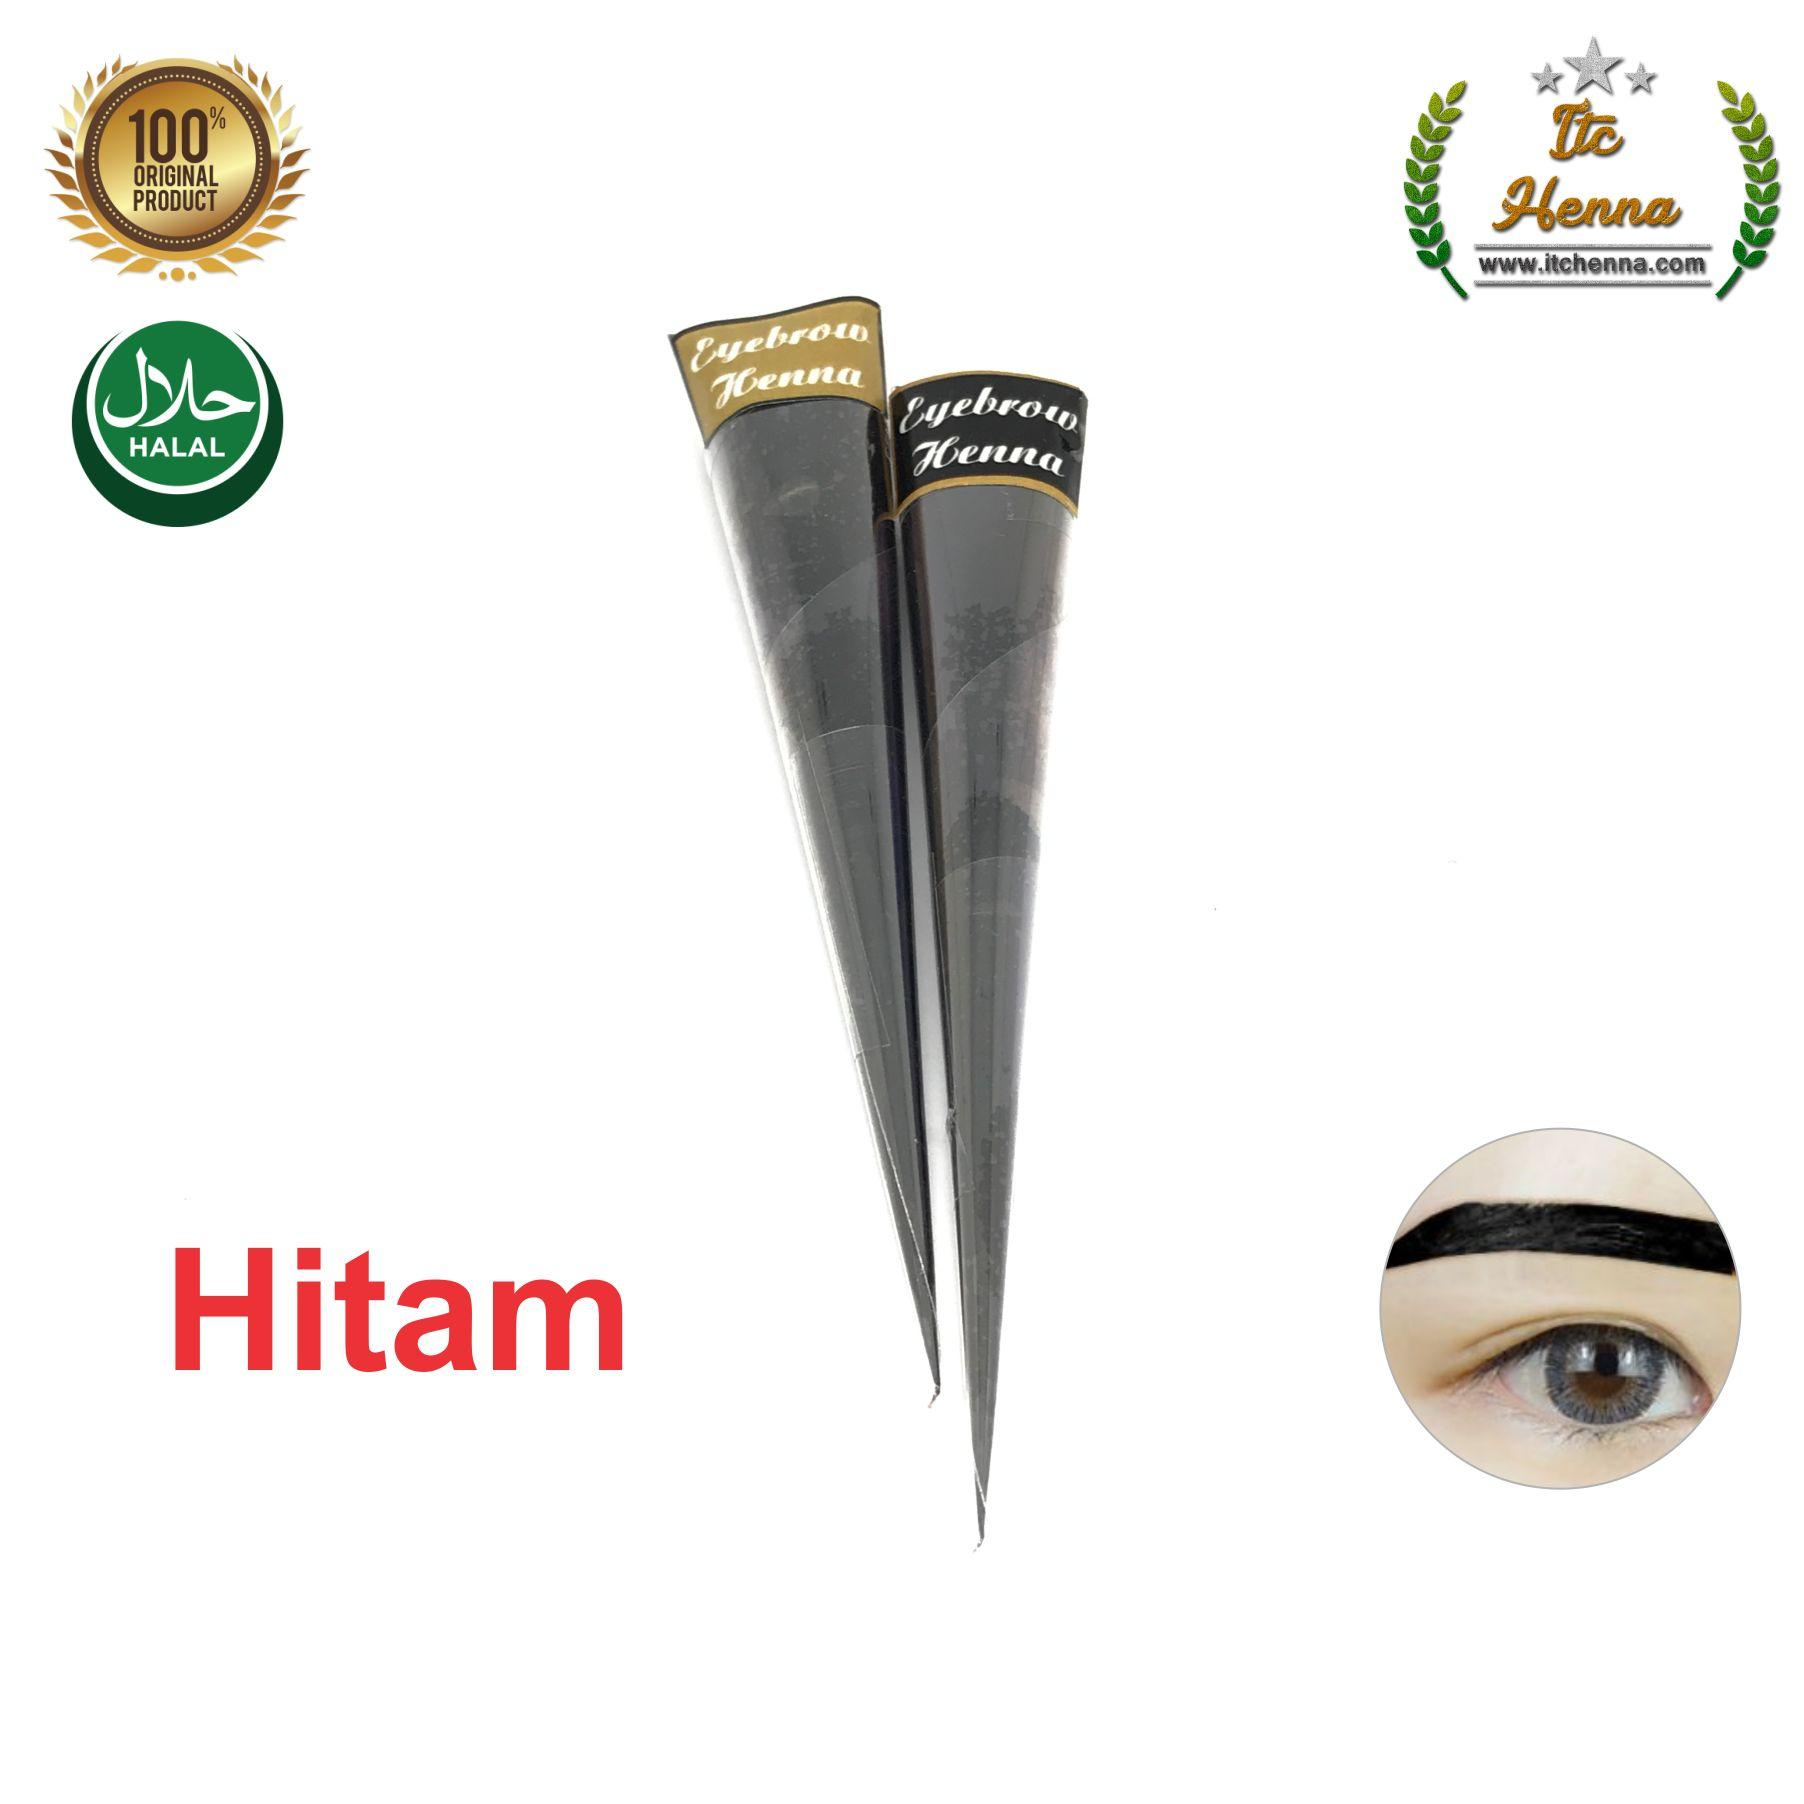 Henna Alis Warna Coklat Dan Hitam Ecer 1 Cone By Itc Henna.